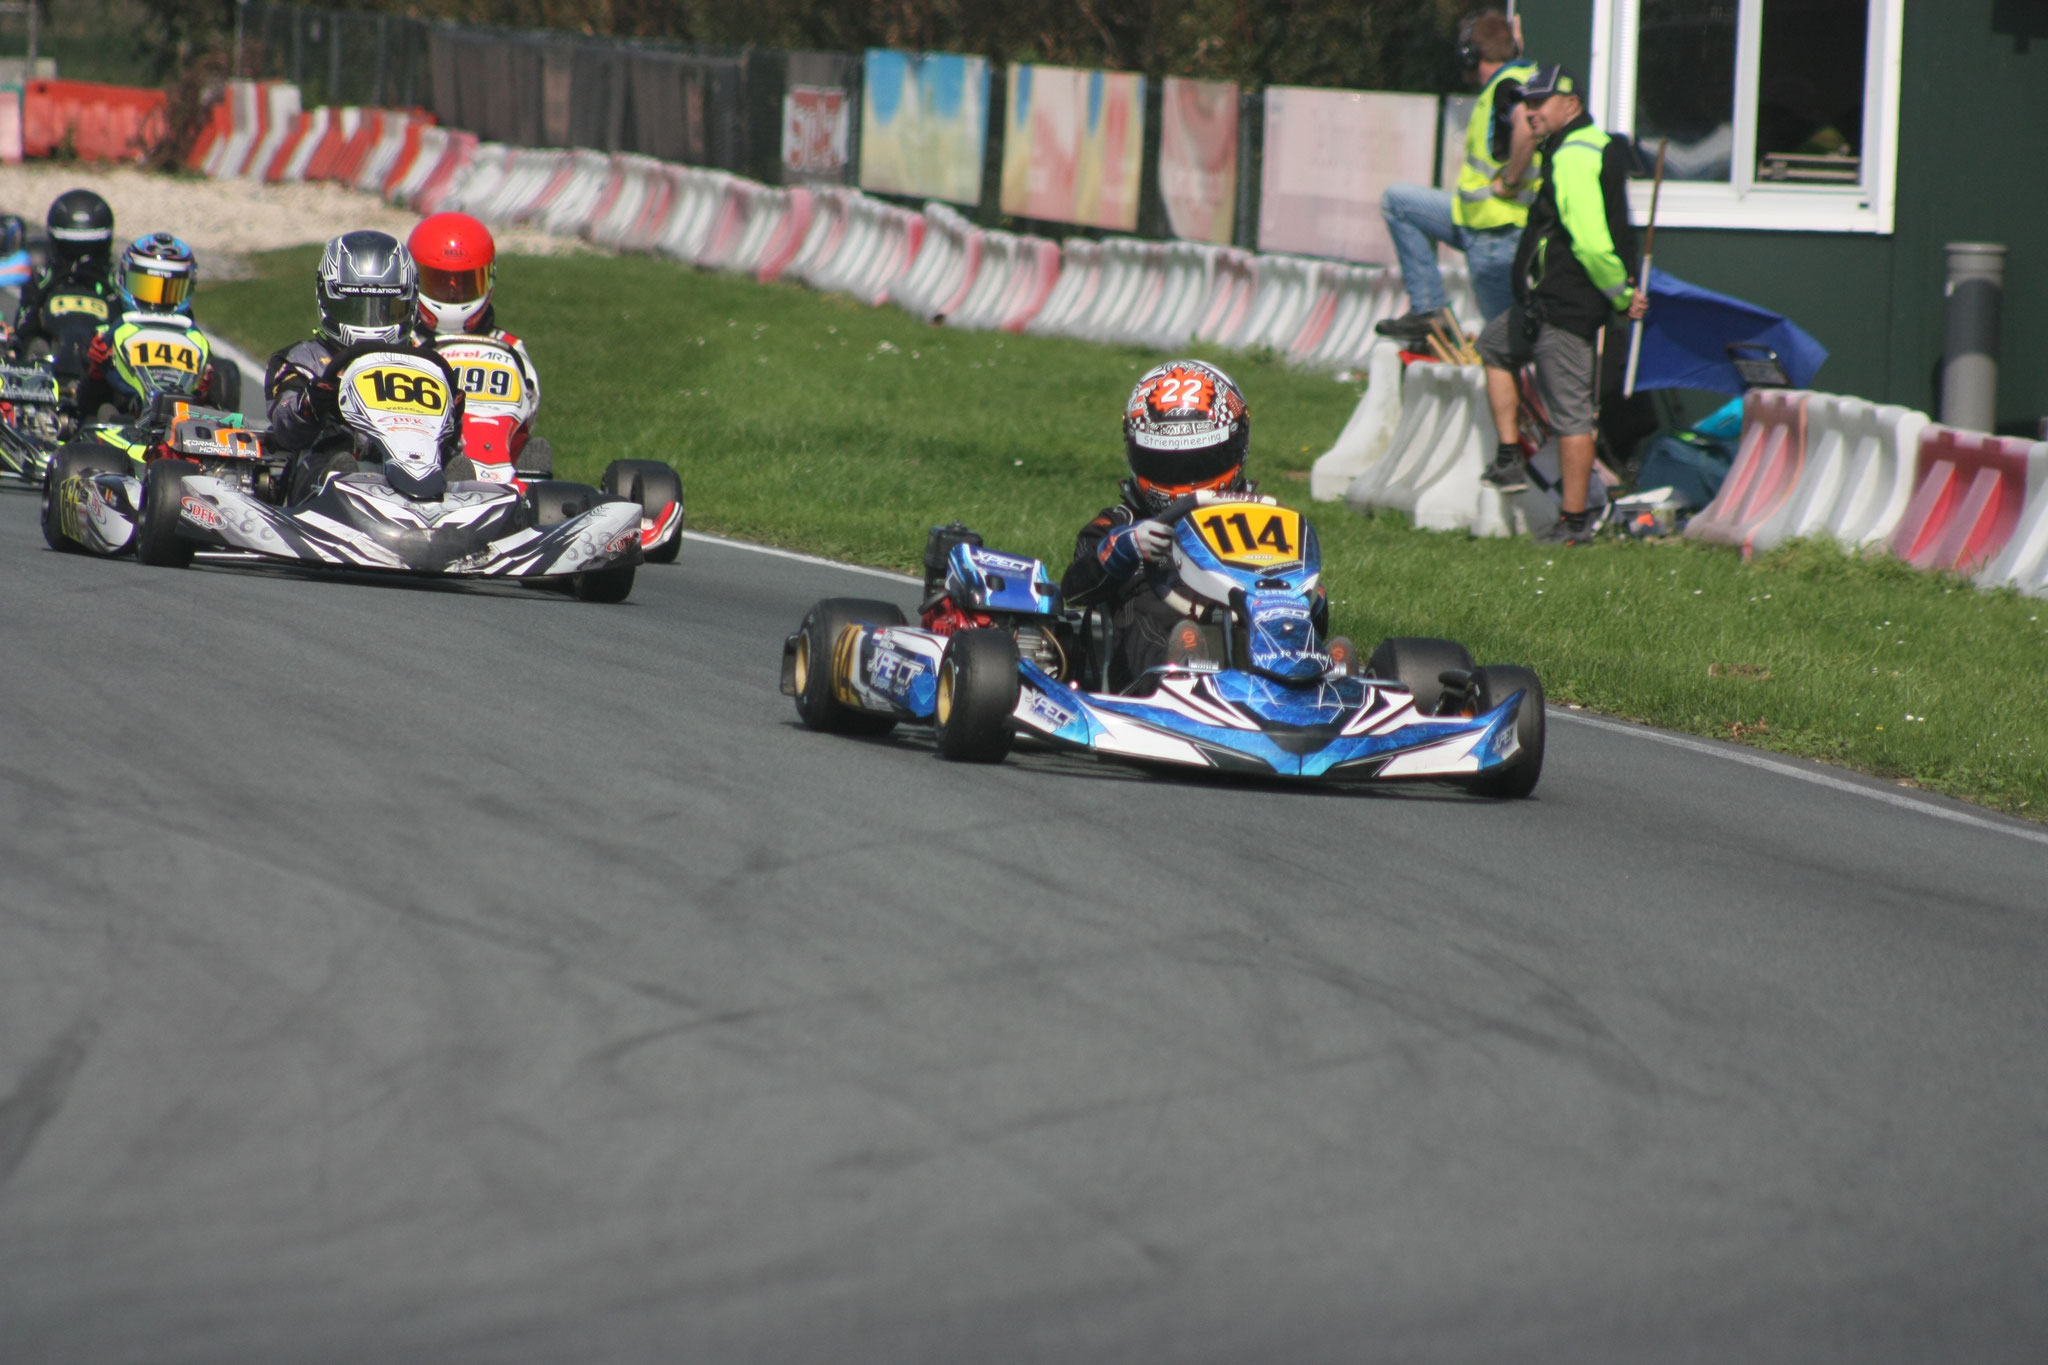 Kwalificatie race 2